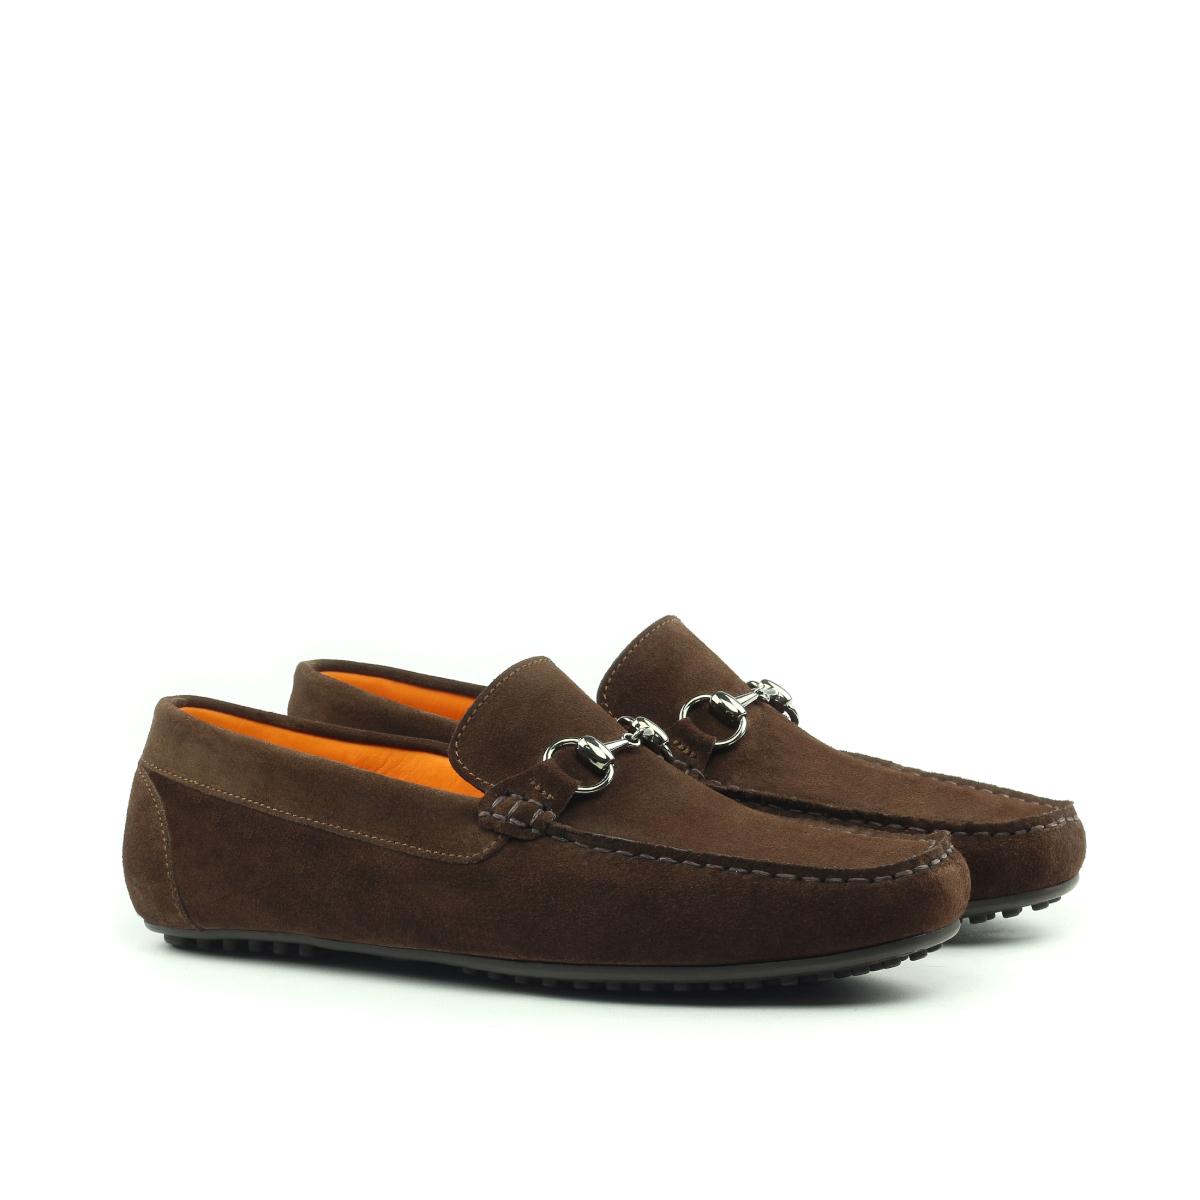 Brown suede tassel loafer with suede tassels